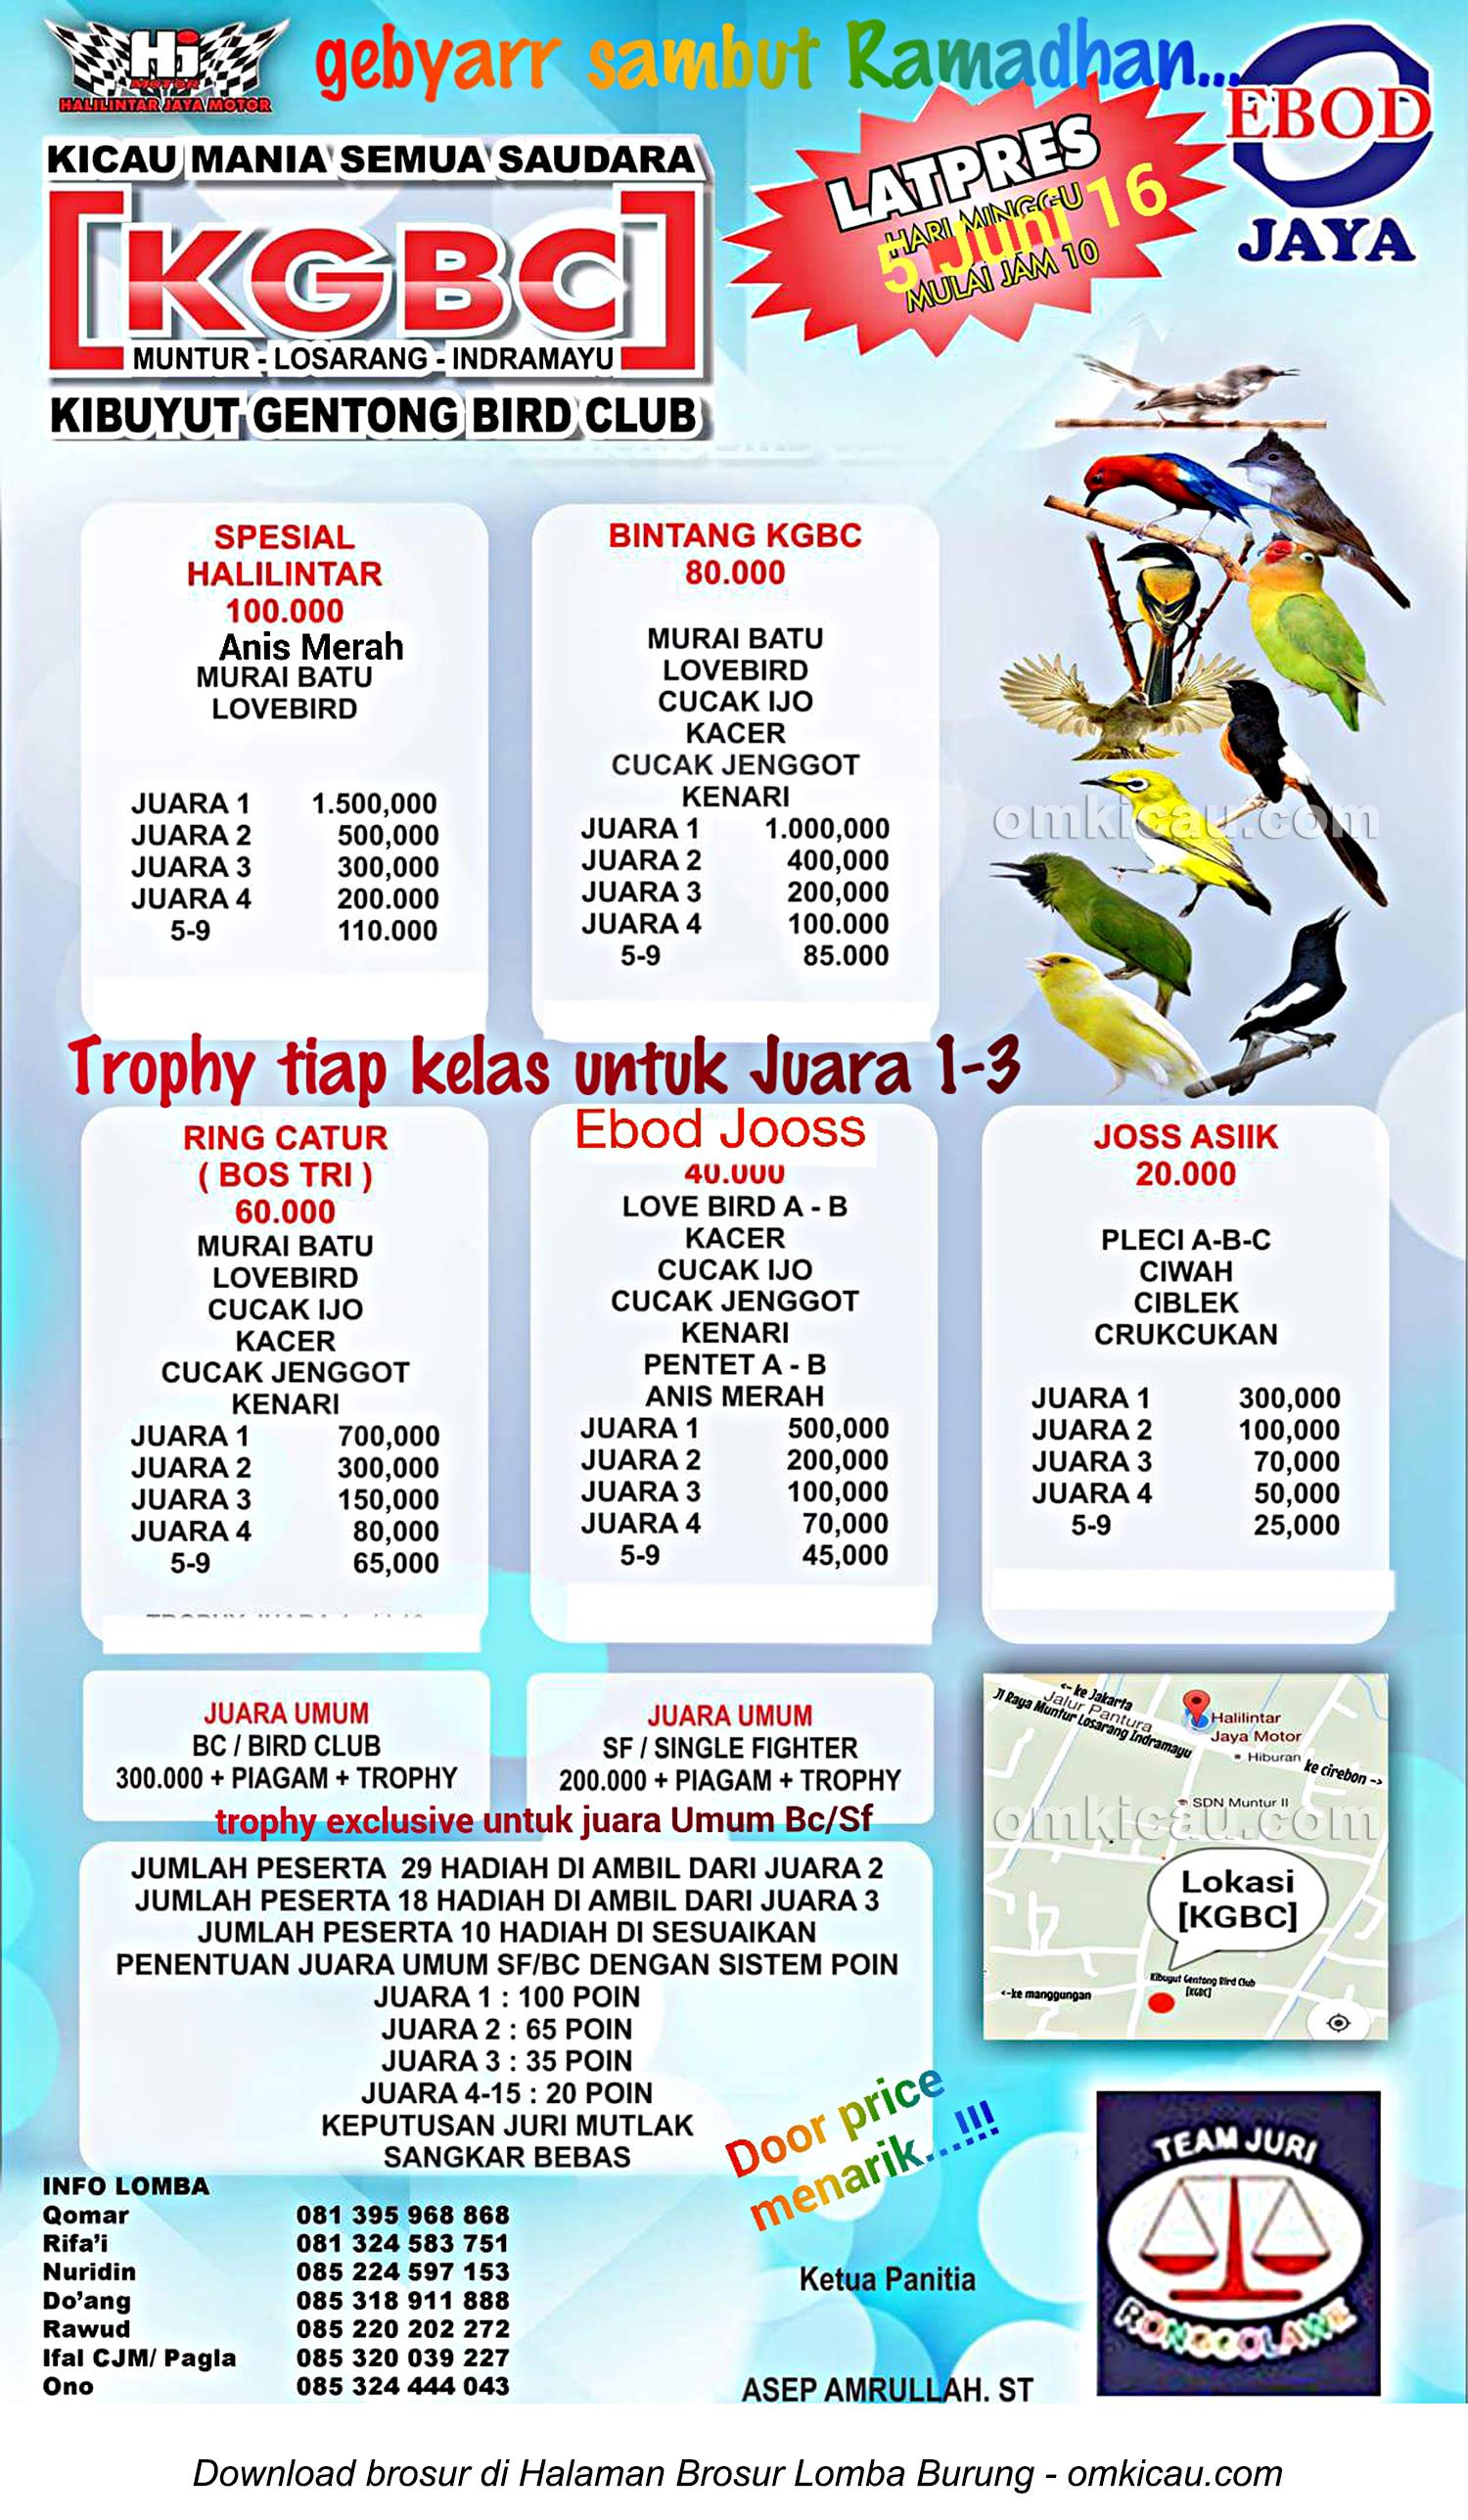 Brosur Latpres KGBC Sambut Ramadhan, Indramayu, 5 Juni 2016